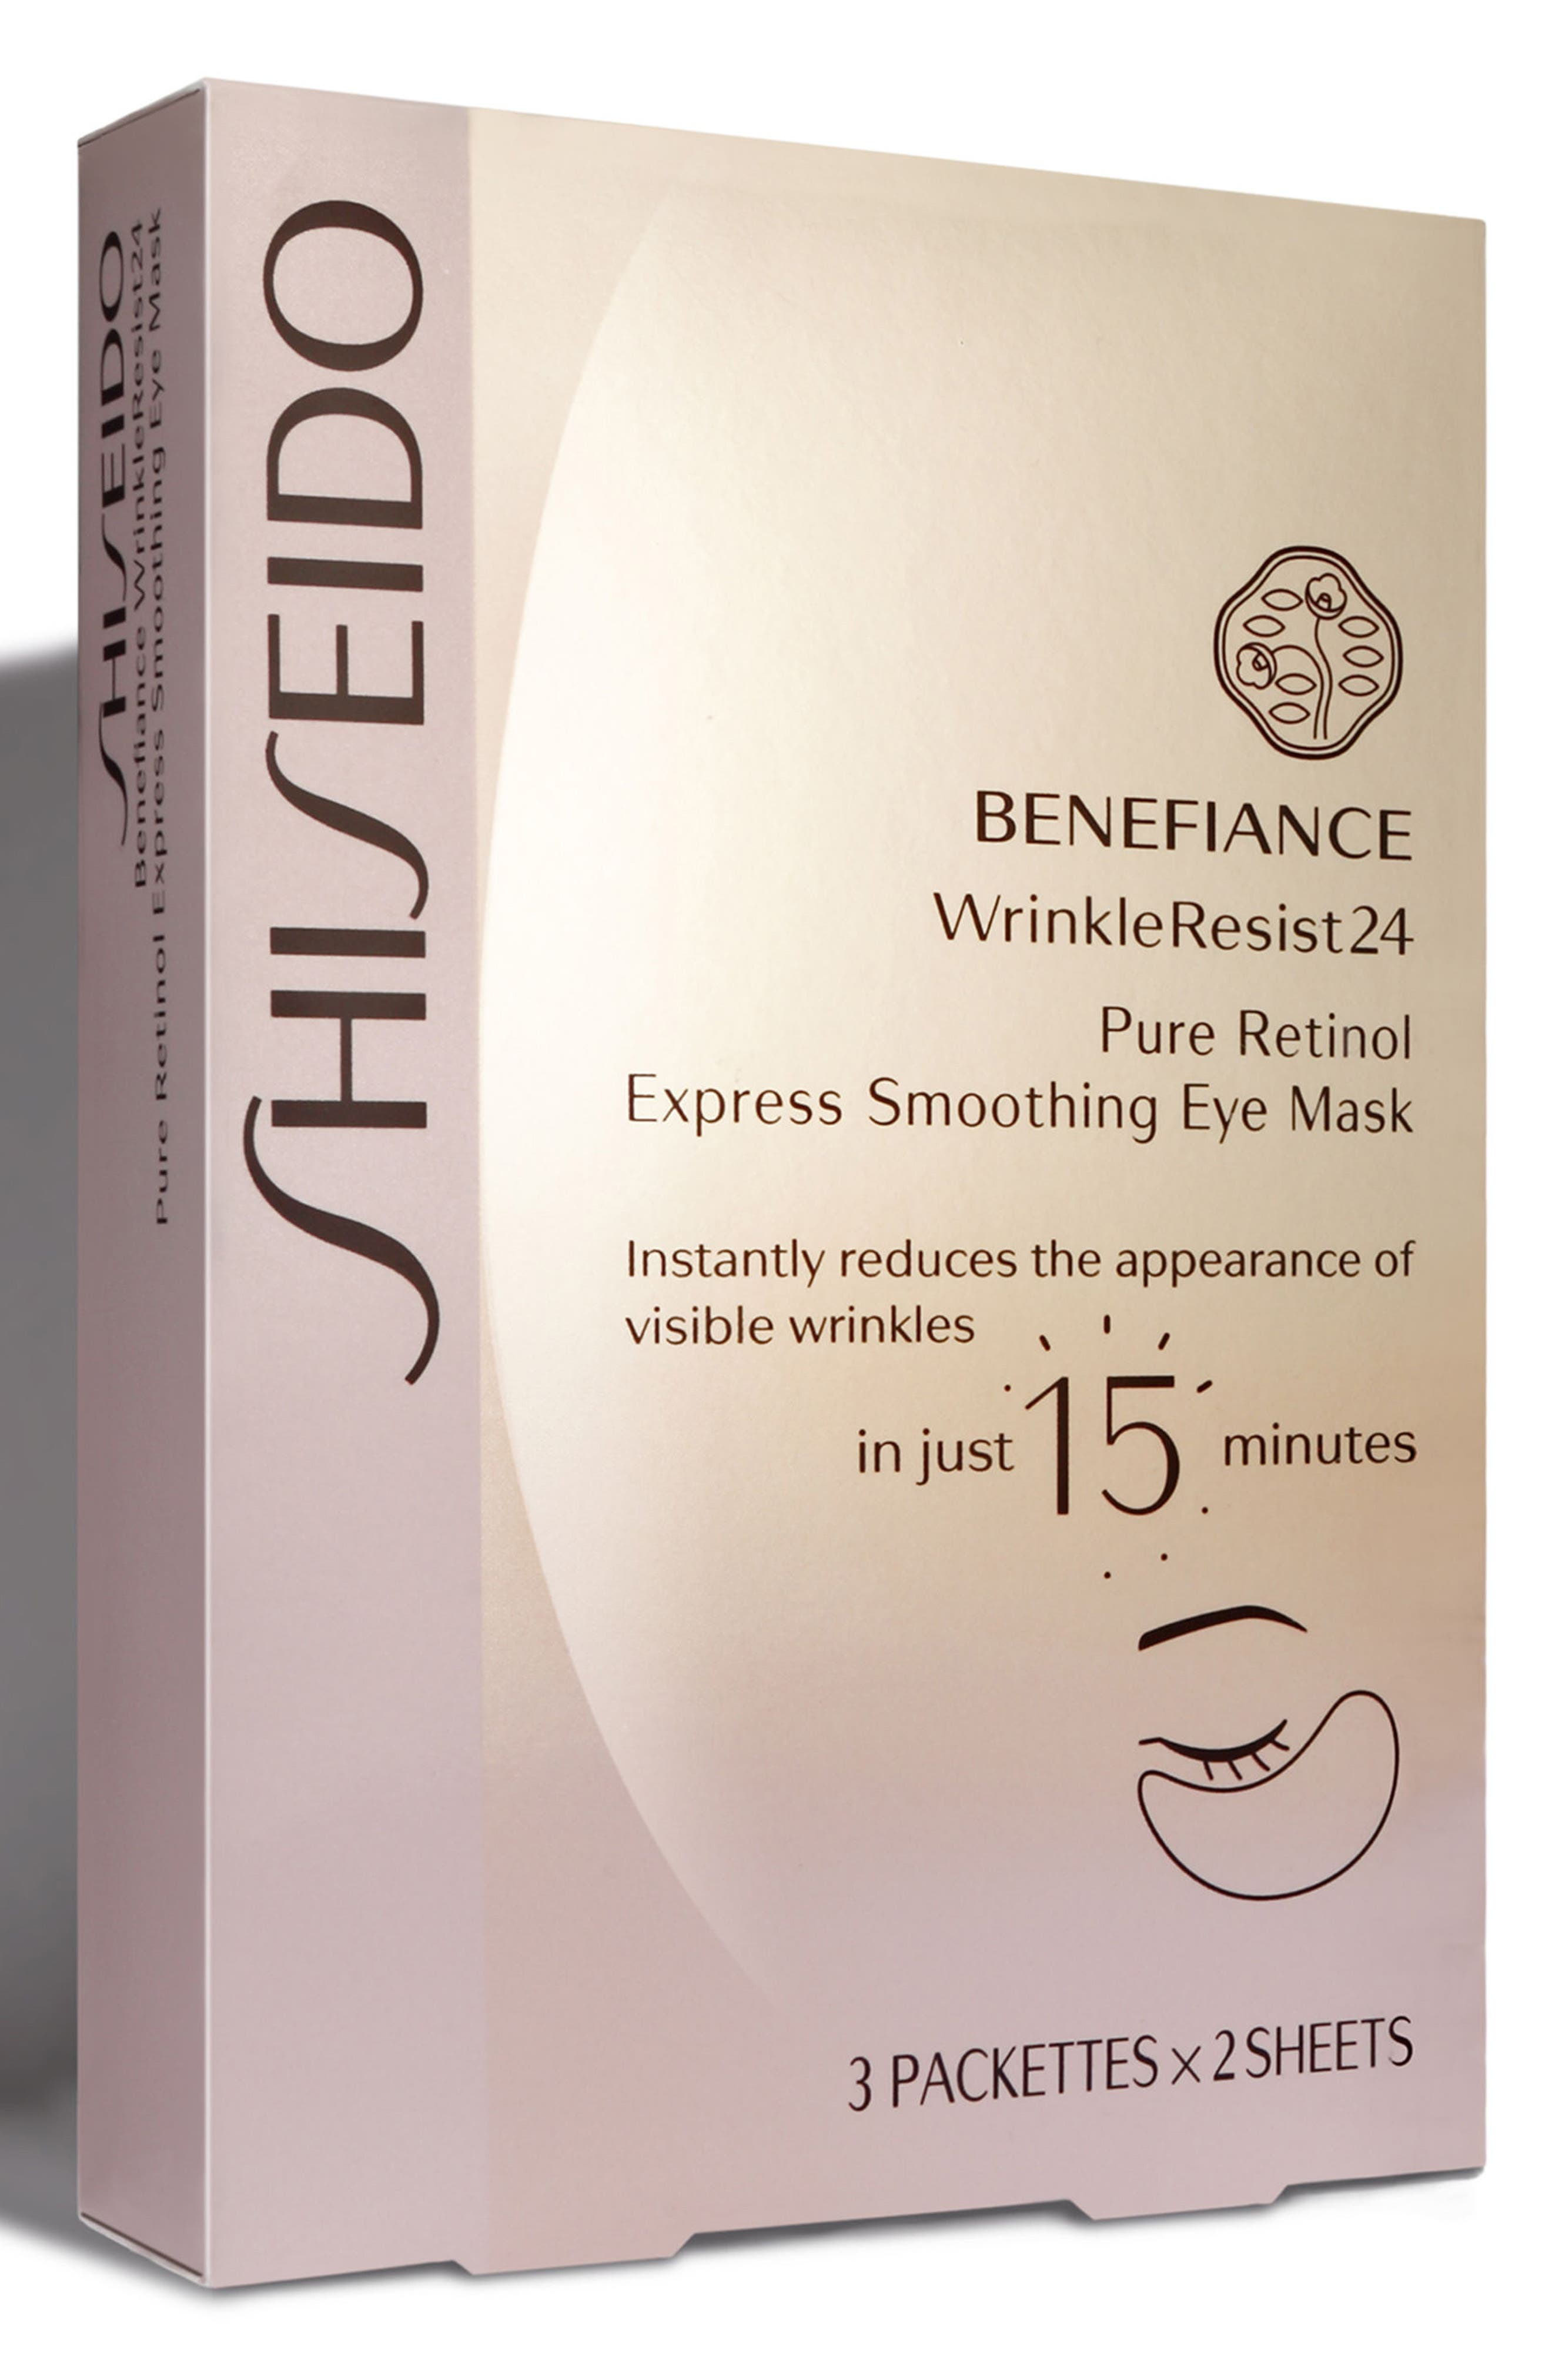 Benefiance WrinkleResist24 Pure Retinol Express Smoothing Eye Mask,                             Main thumbnail 1, color,                             No Color